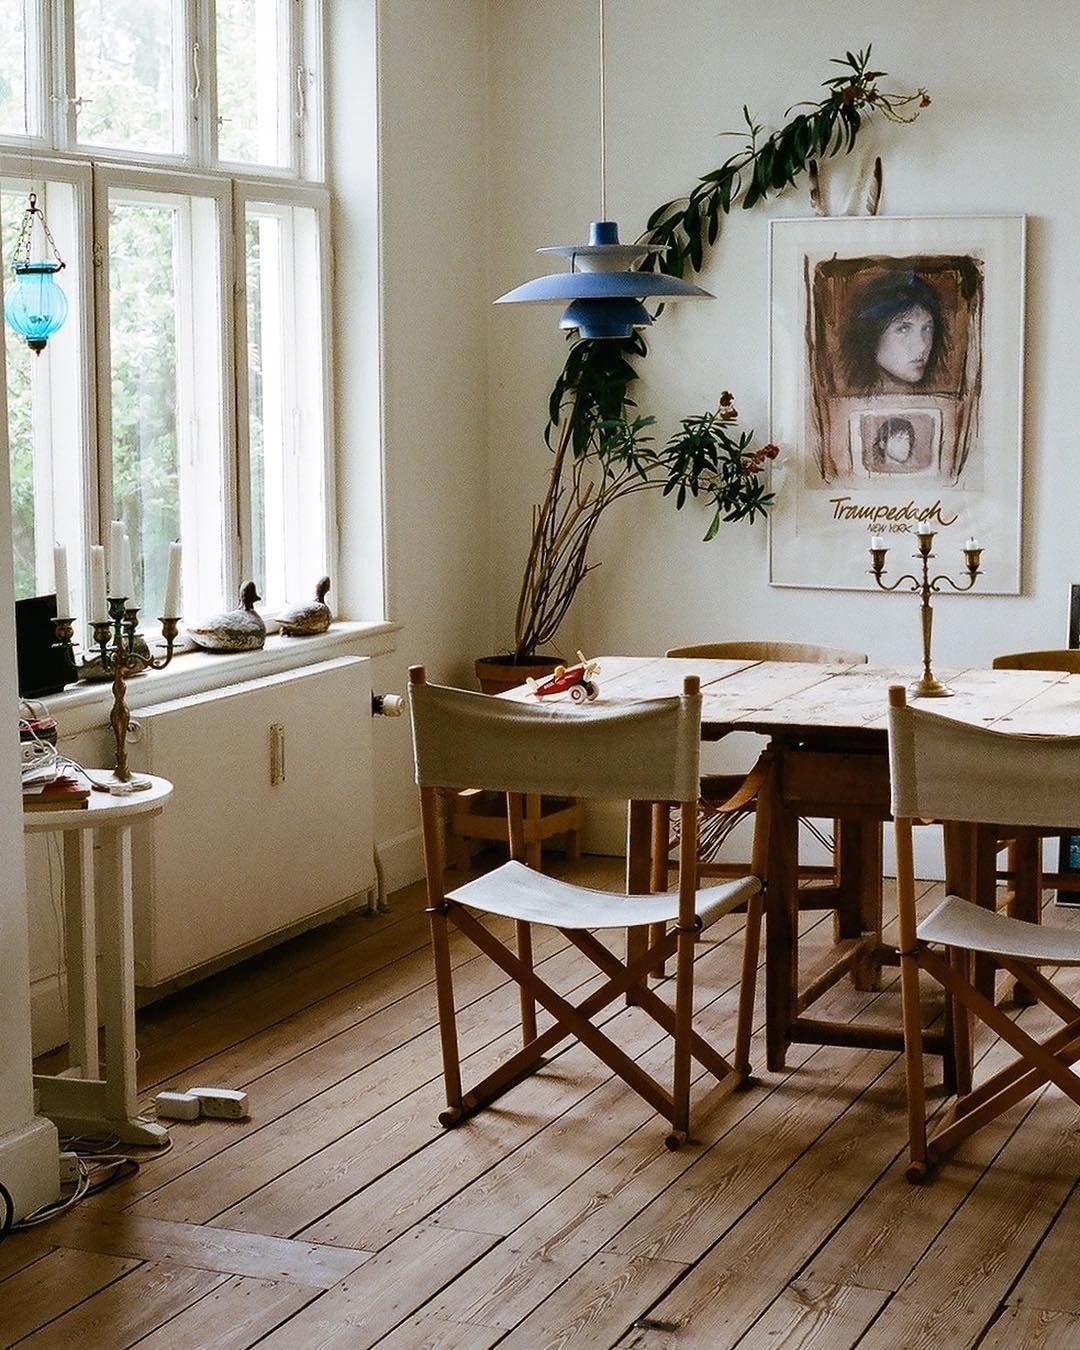 Pin de Maryann Vezina en autre | Pinterest | Estudio de pintura ...